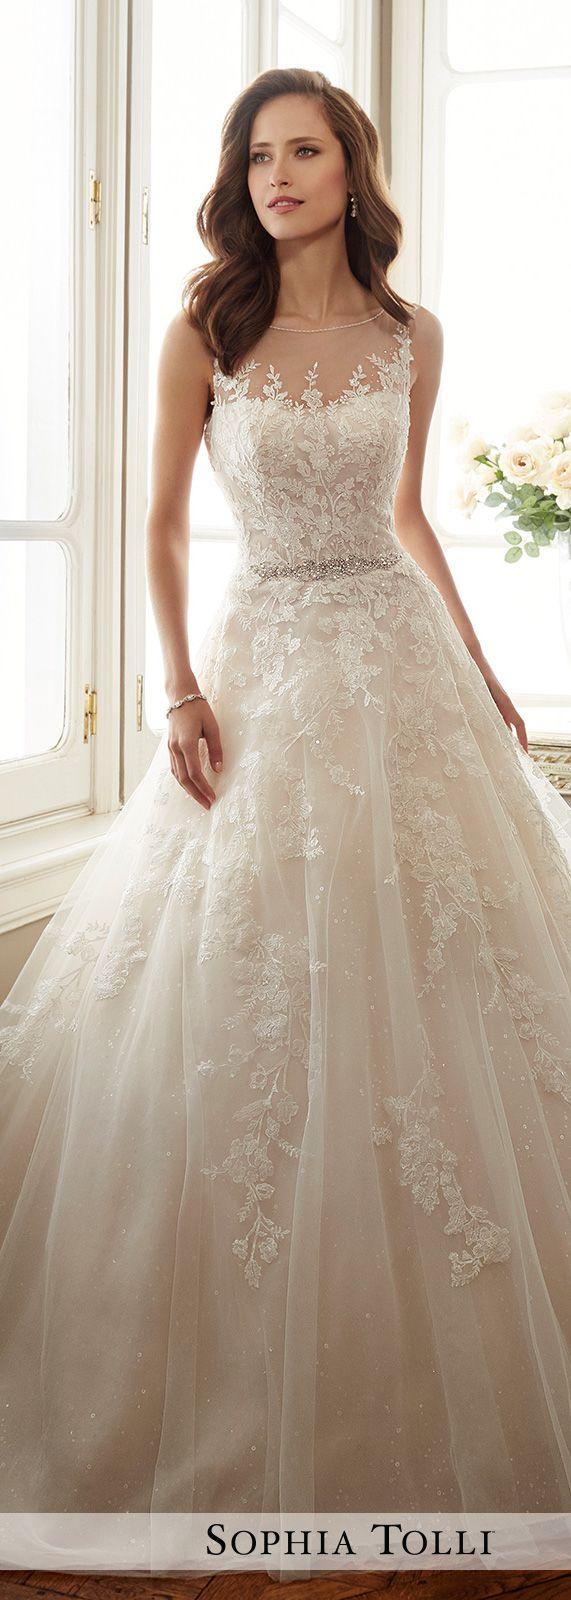 best wedding things images on pinterest wedding ideas weddings